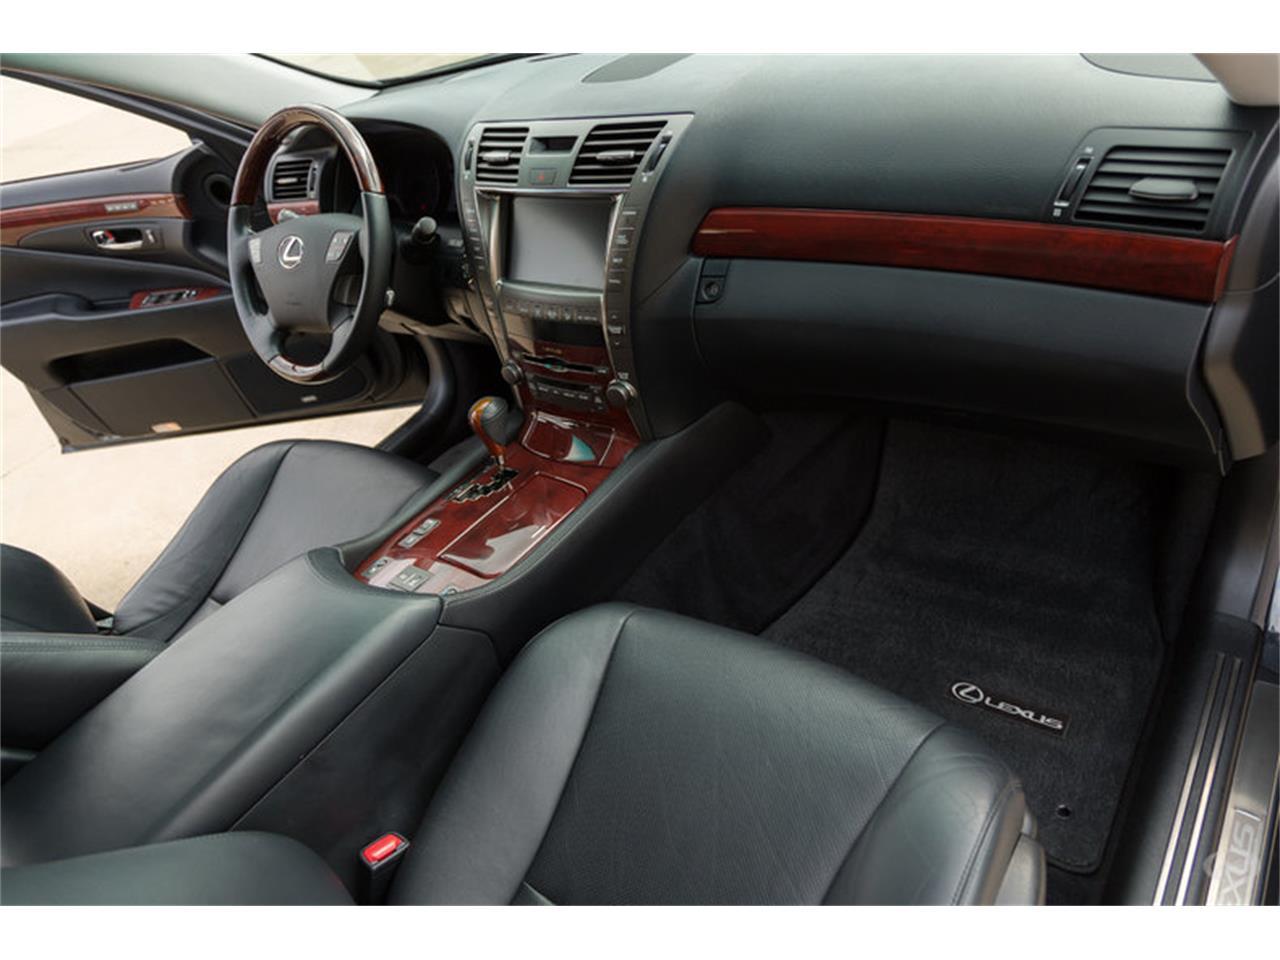 Large Picture of 2008 Lexus LS460 - $19,900.00 - L6Q7